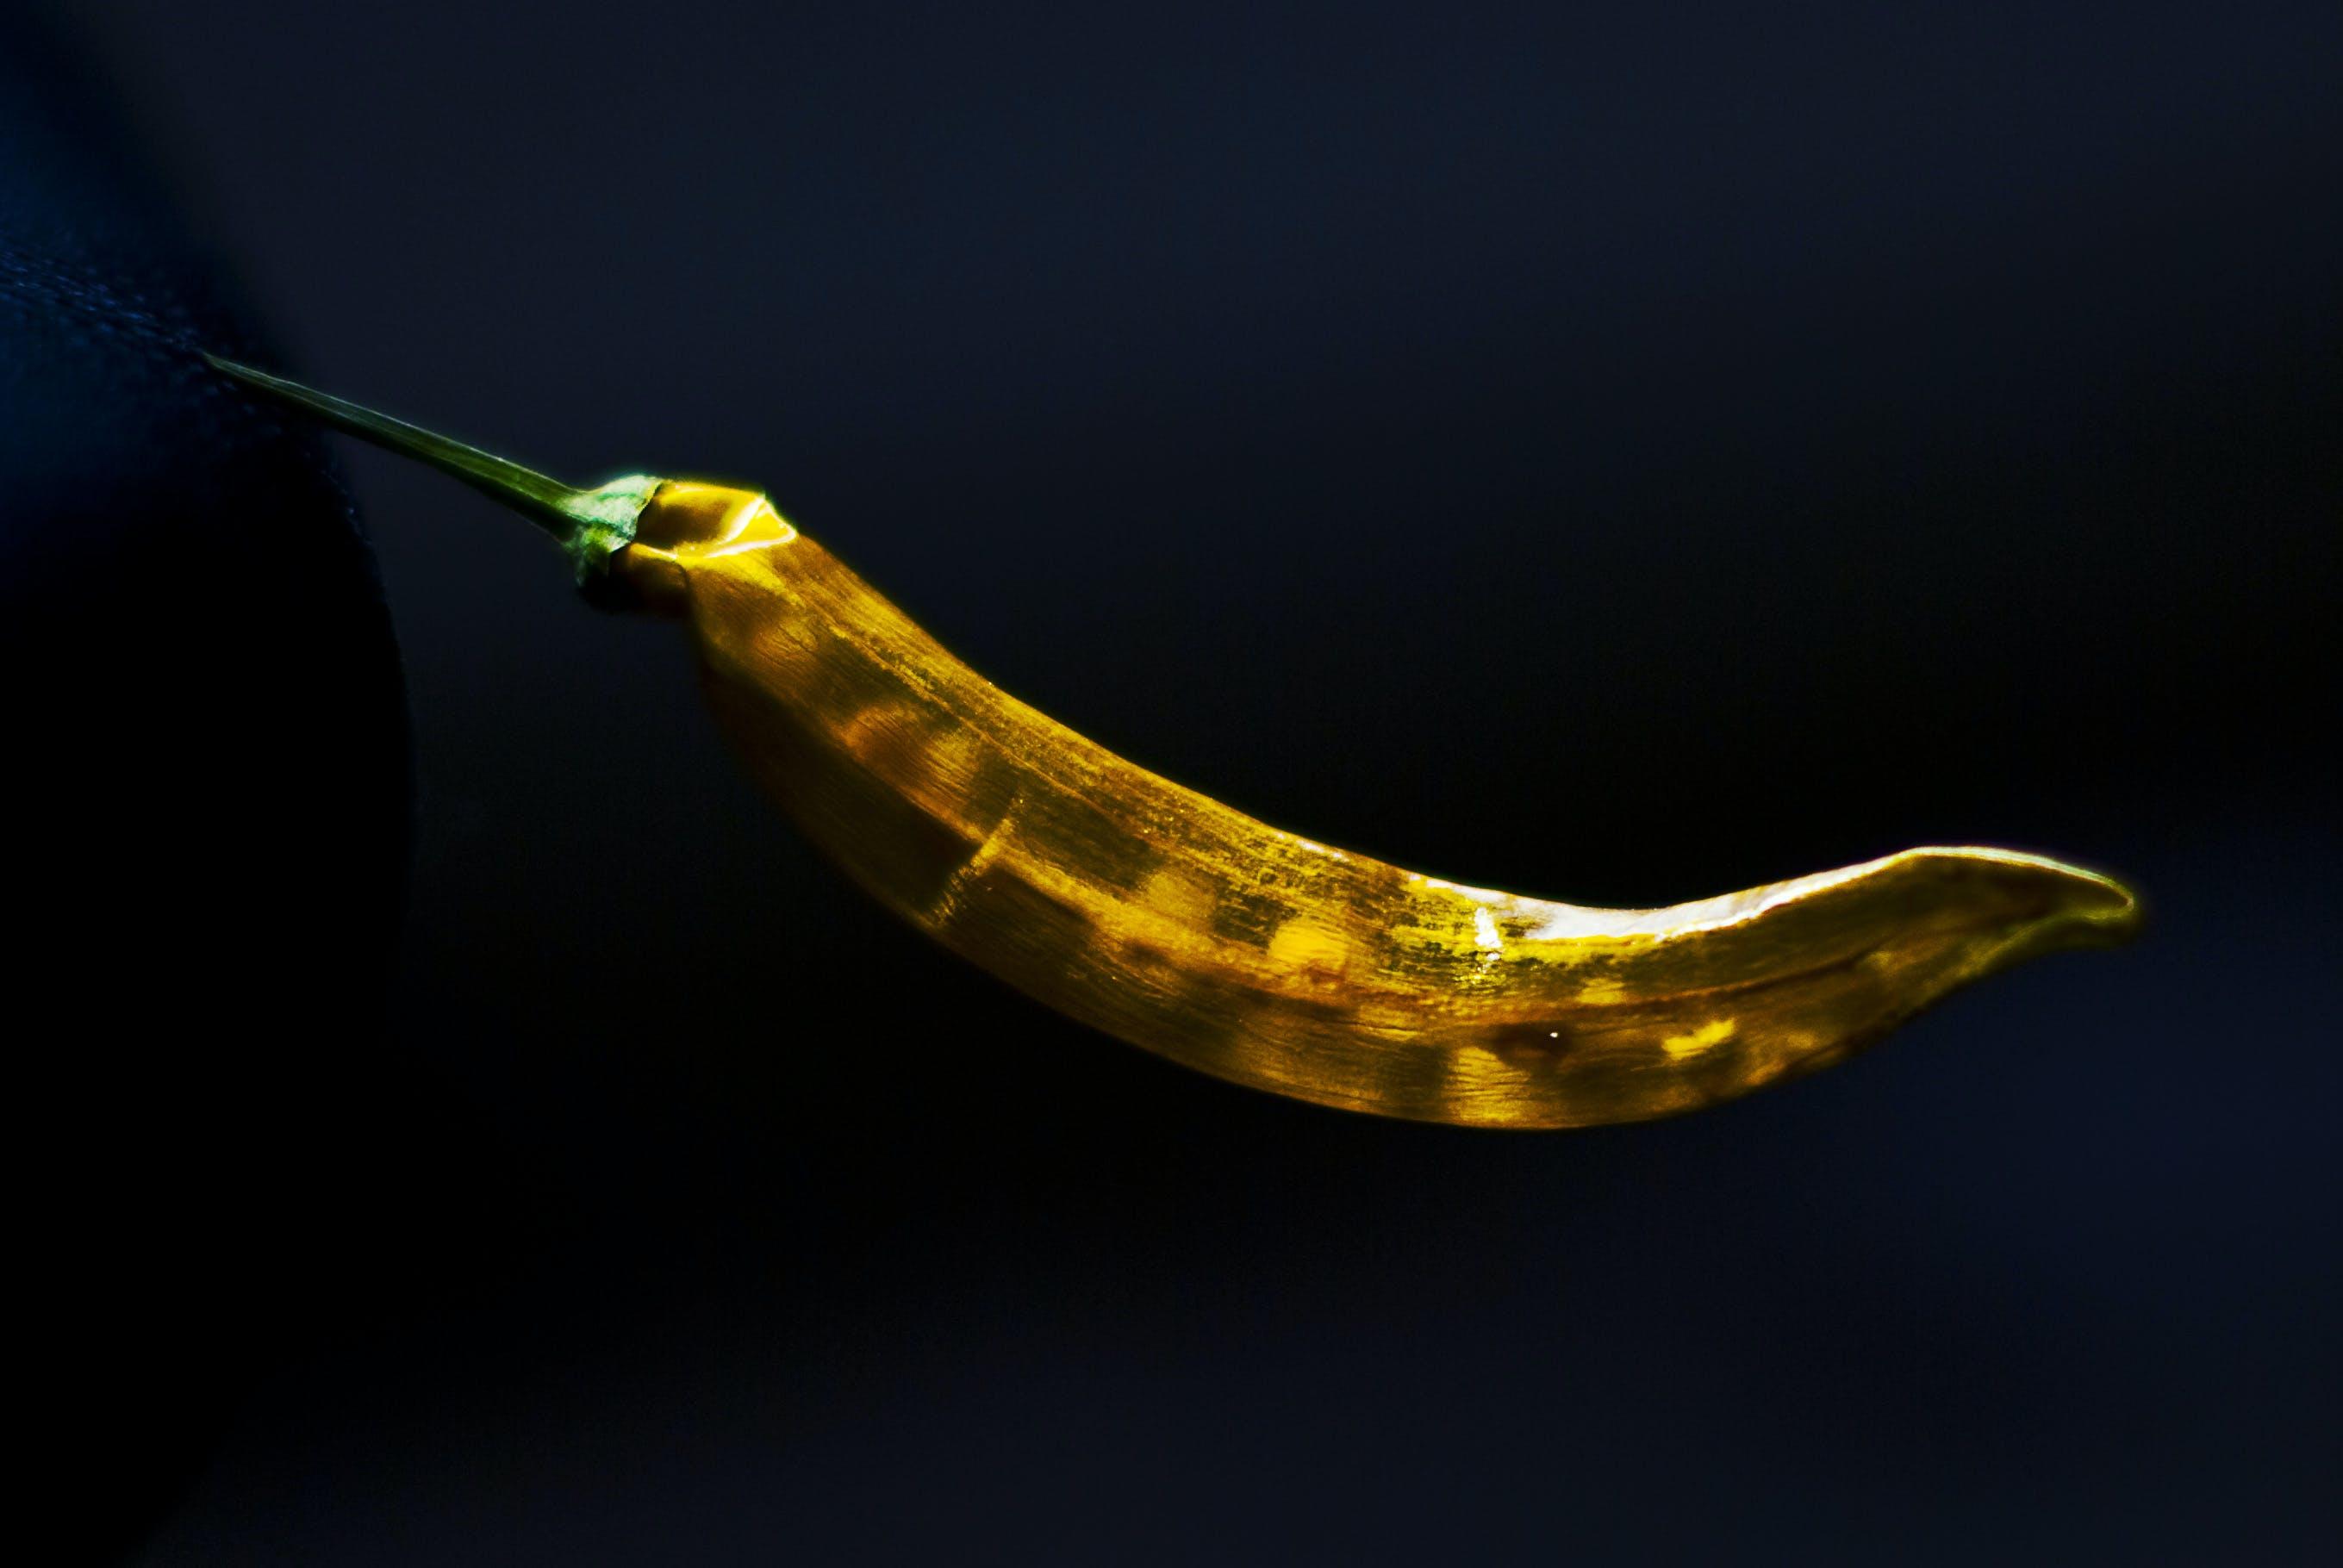 Free stock photo of dry, yellow, transparent, chilli